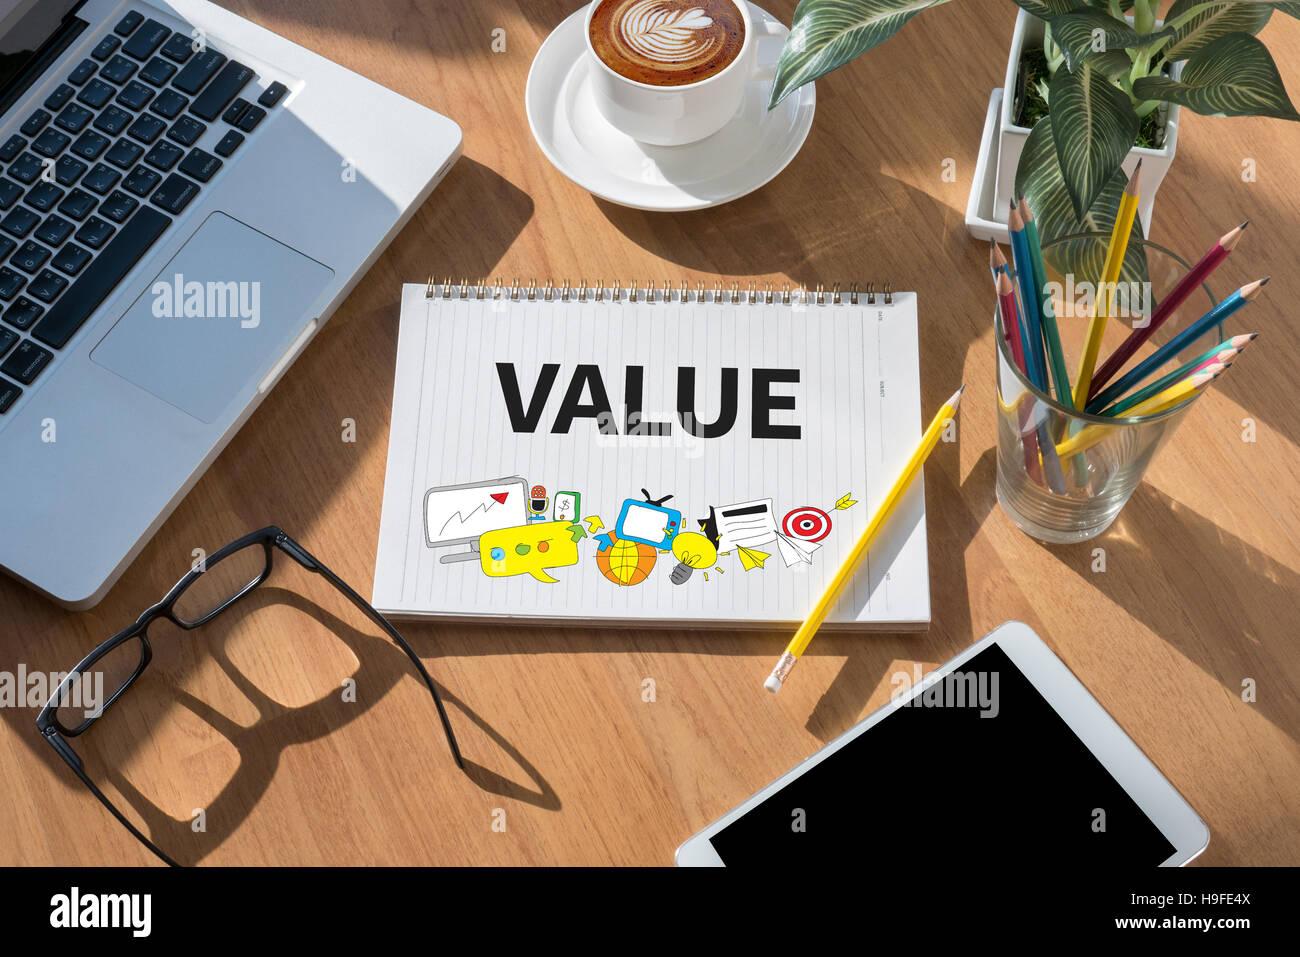 Value - Stock Image